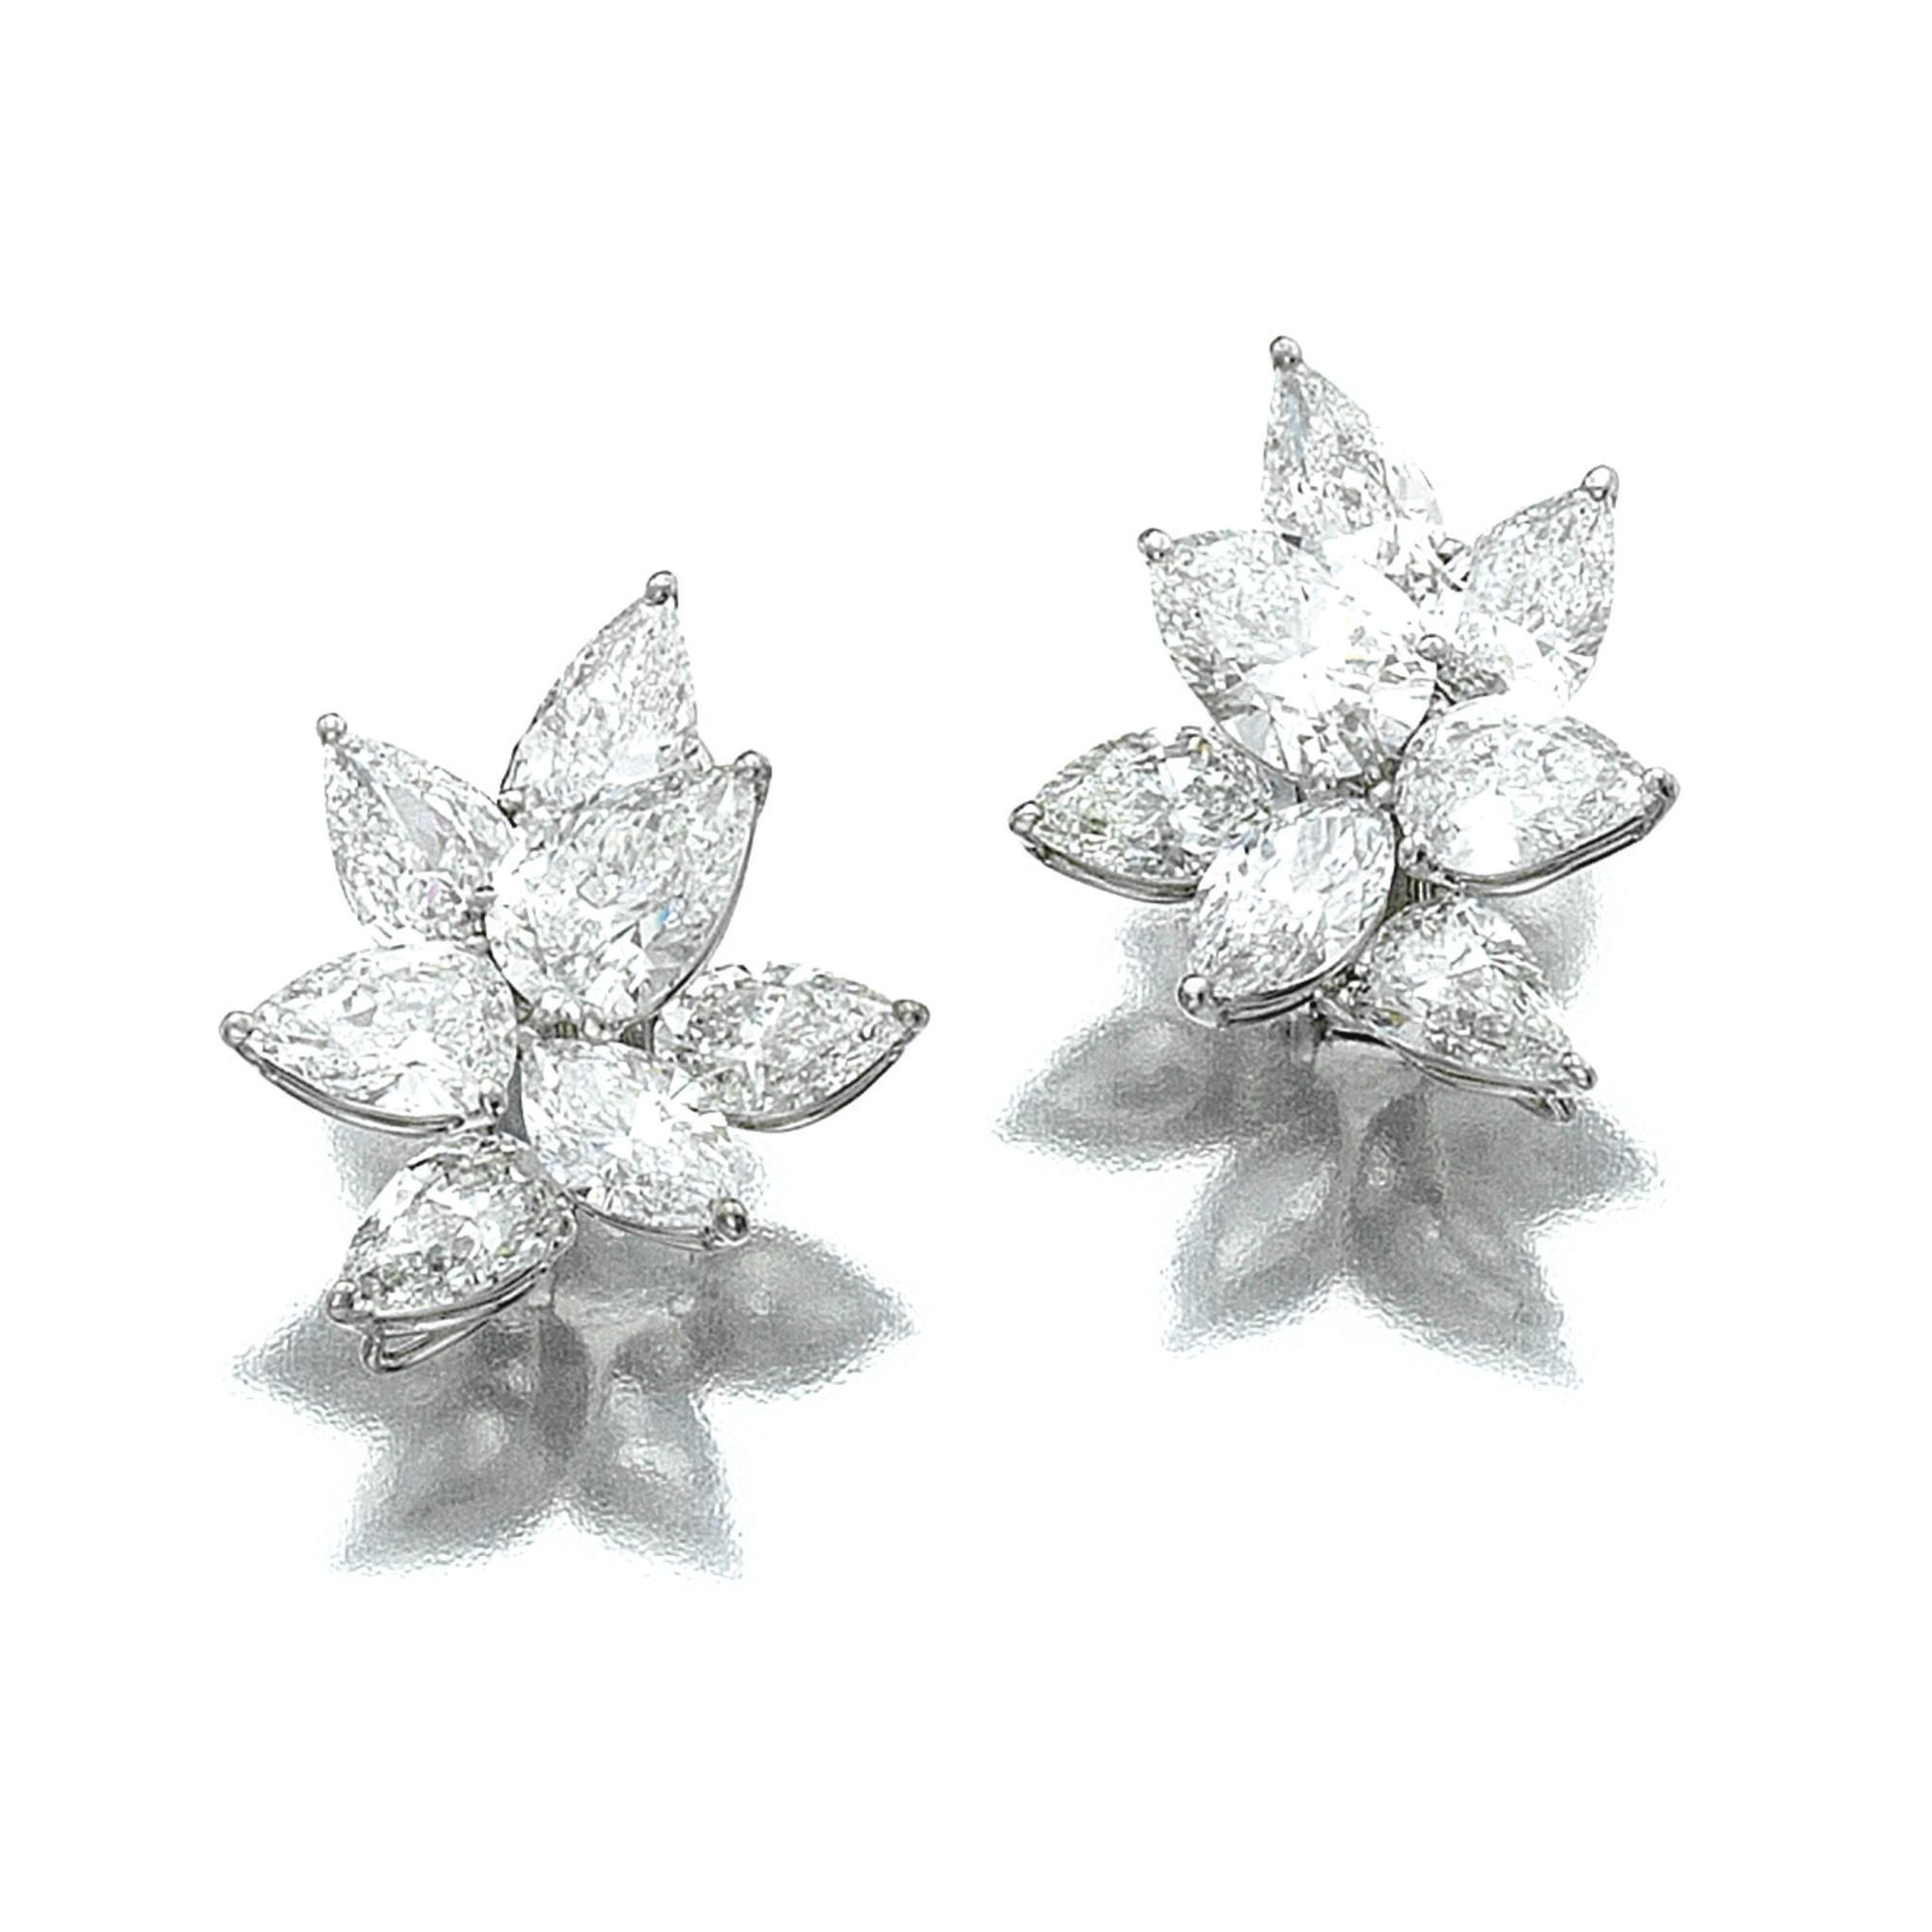 Pair of diamond ear clips   lot   Sotheby's